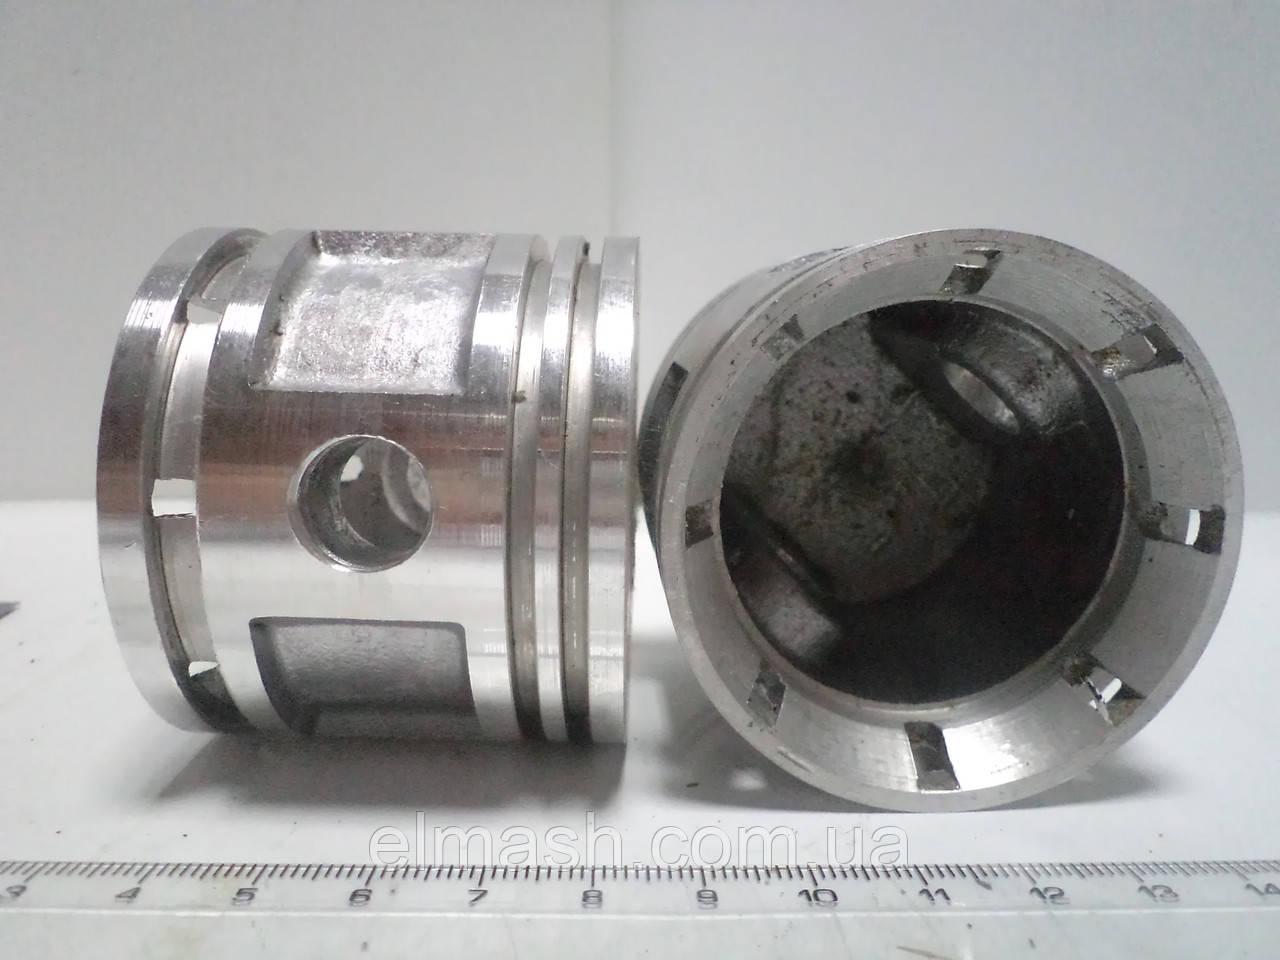 Поршень компрессора Р3 КАМАЗ, ЗИЛ, МАЗ, Т-150, КРАЗ